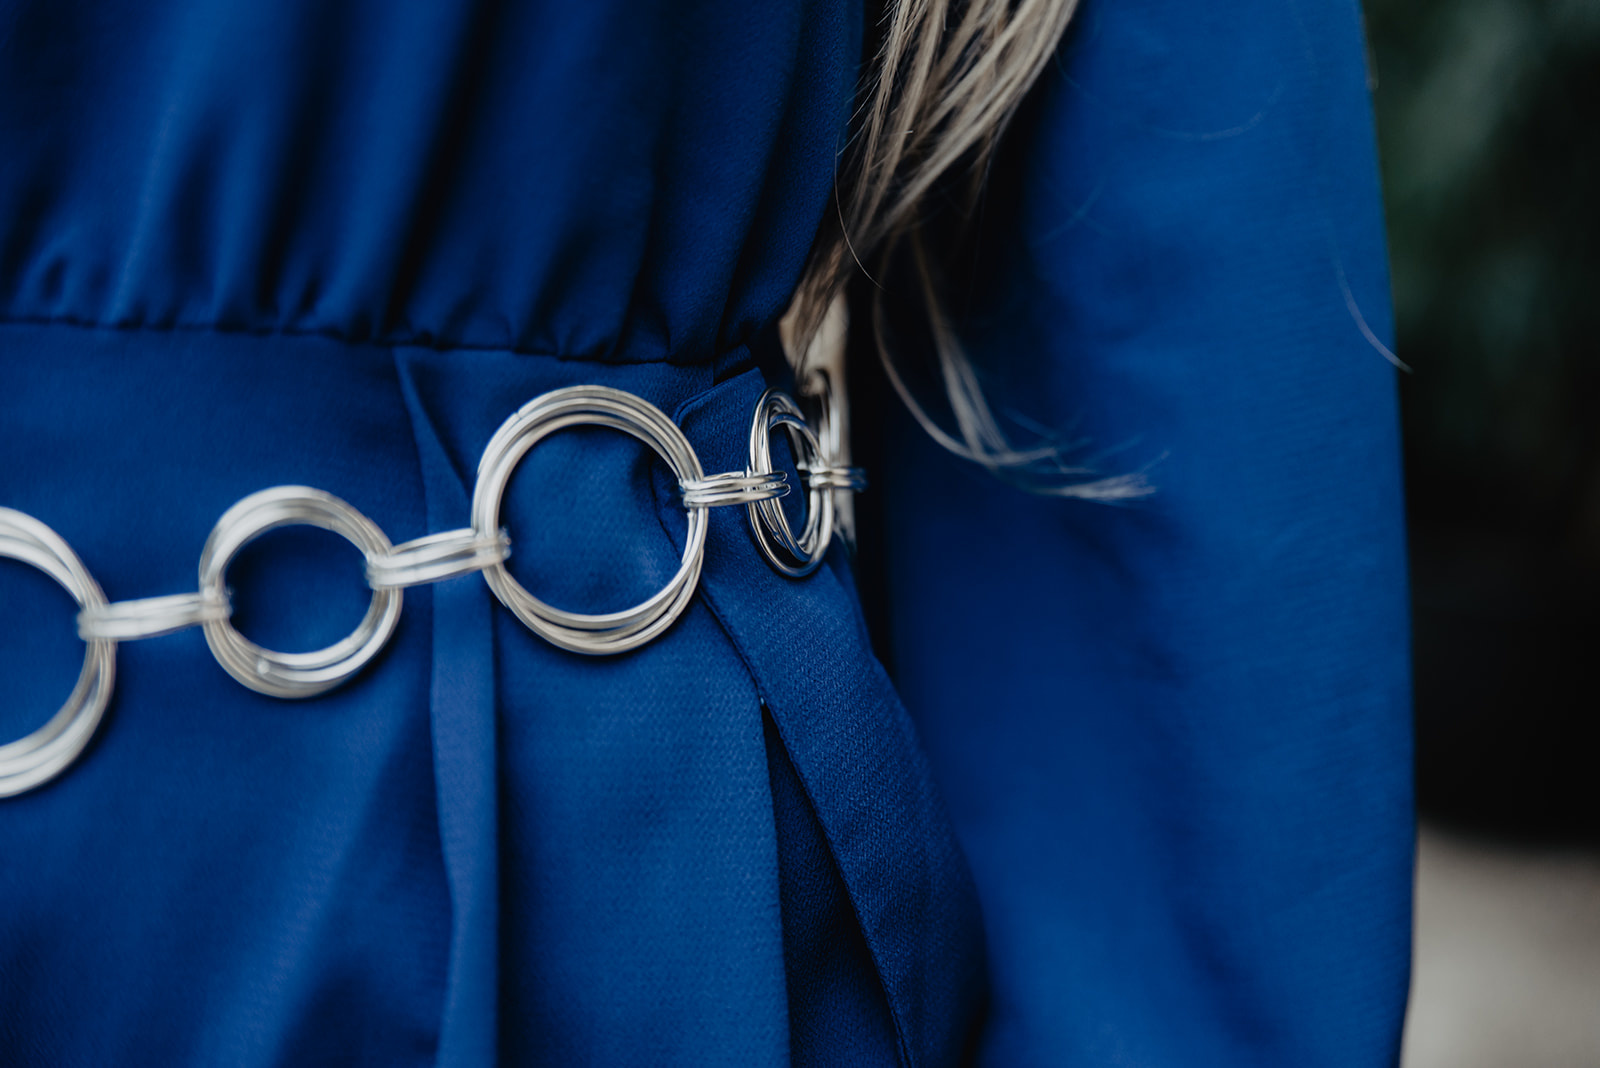 Dé zomertrend van 2019: Chain Belts van By Shir